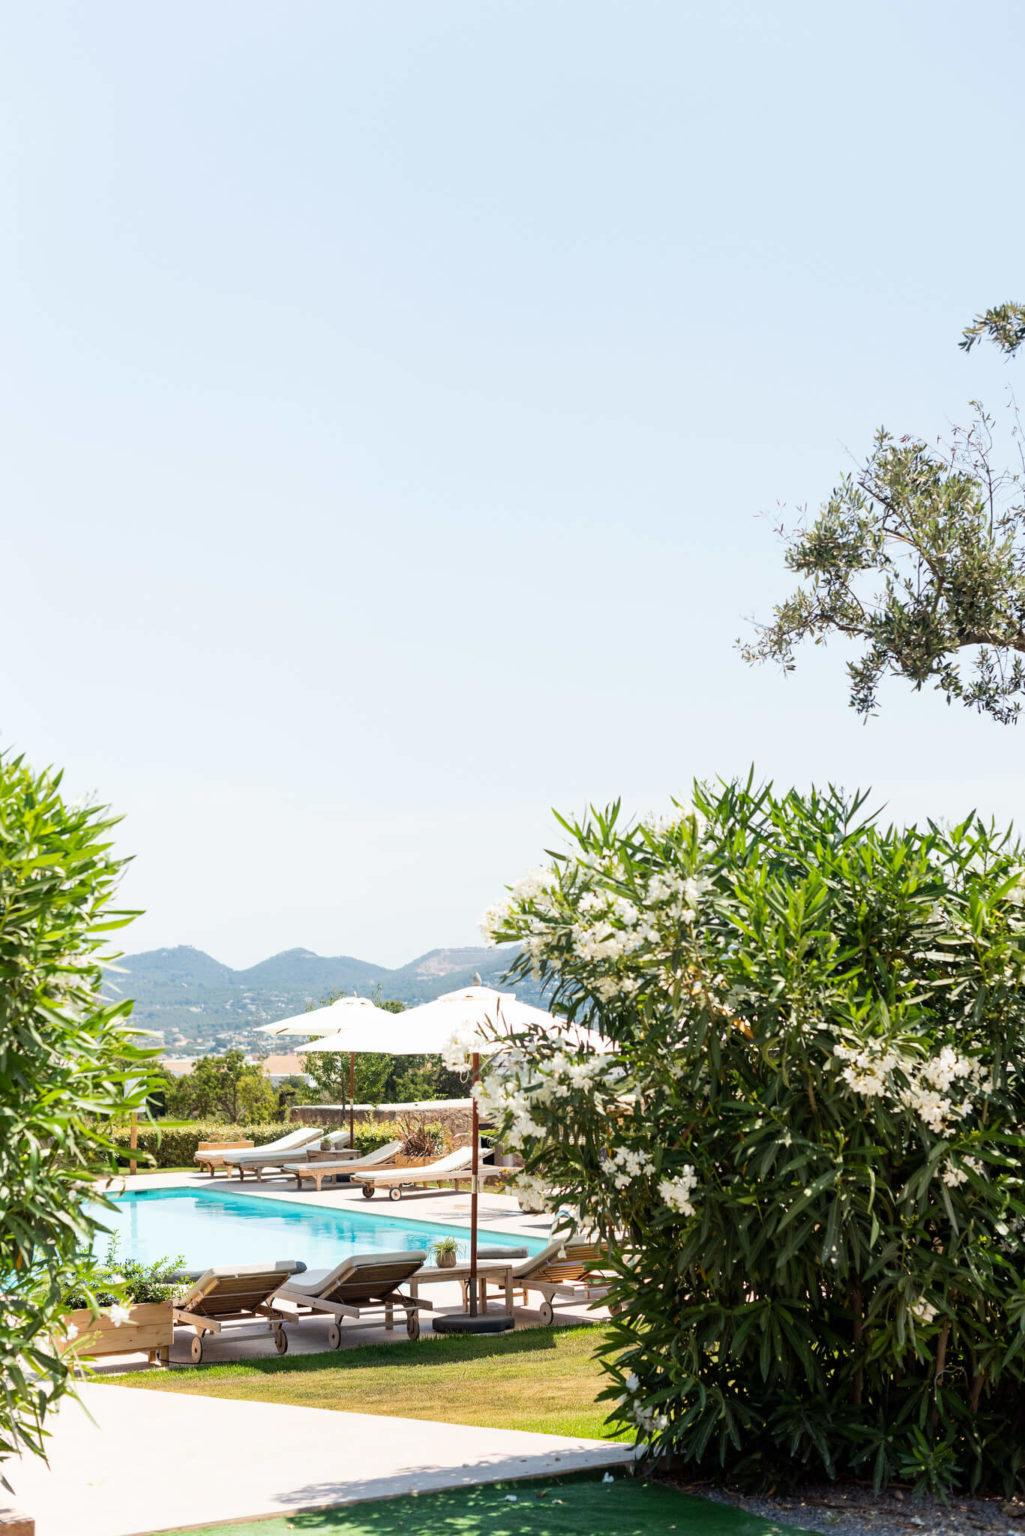 https://www.white-ibiza.com/wp-content/uploads/2020/03/white-ibiza-boutique-hotels-casa-maca-2020-08-1025x1536.jpg